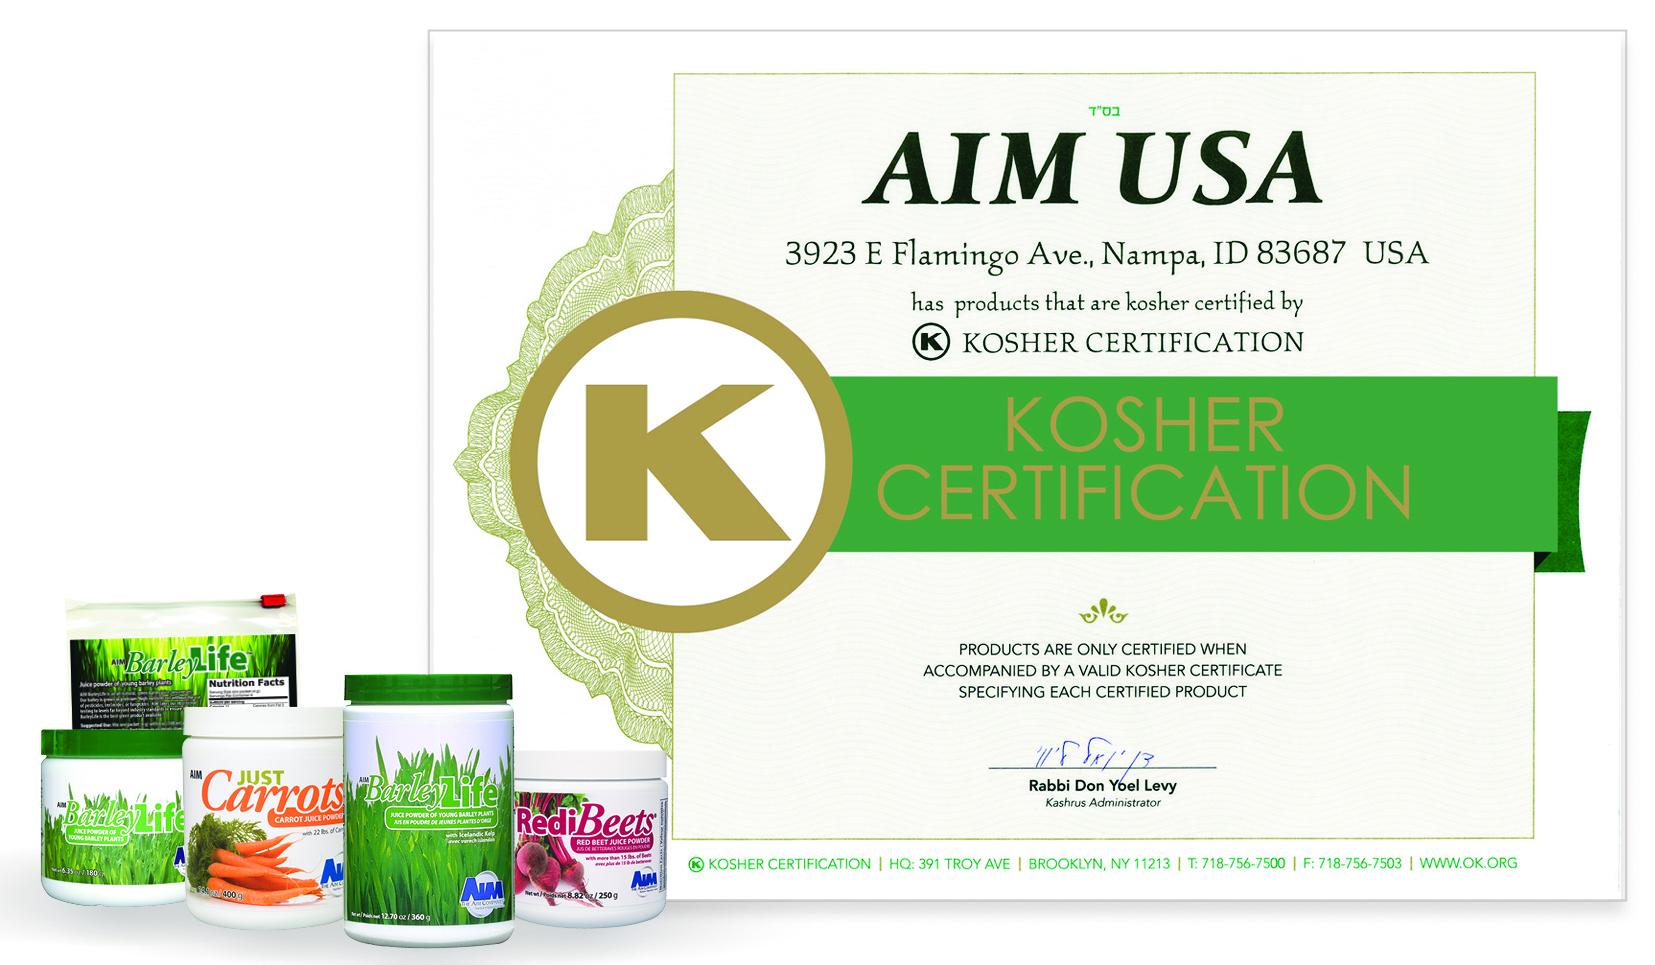 Kosher certified nutritional products the barleylife blog buycottarizona Choice Image